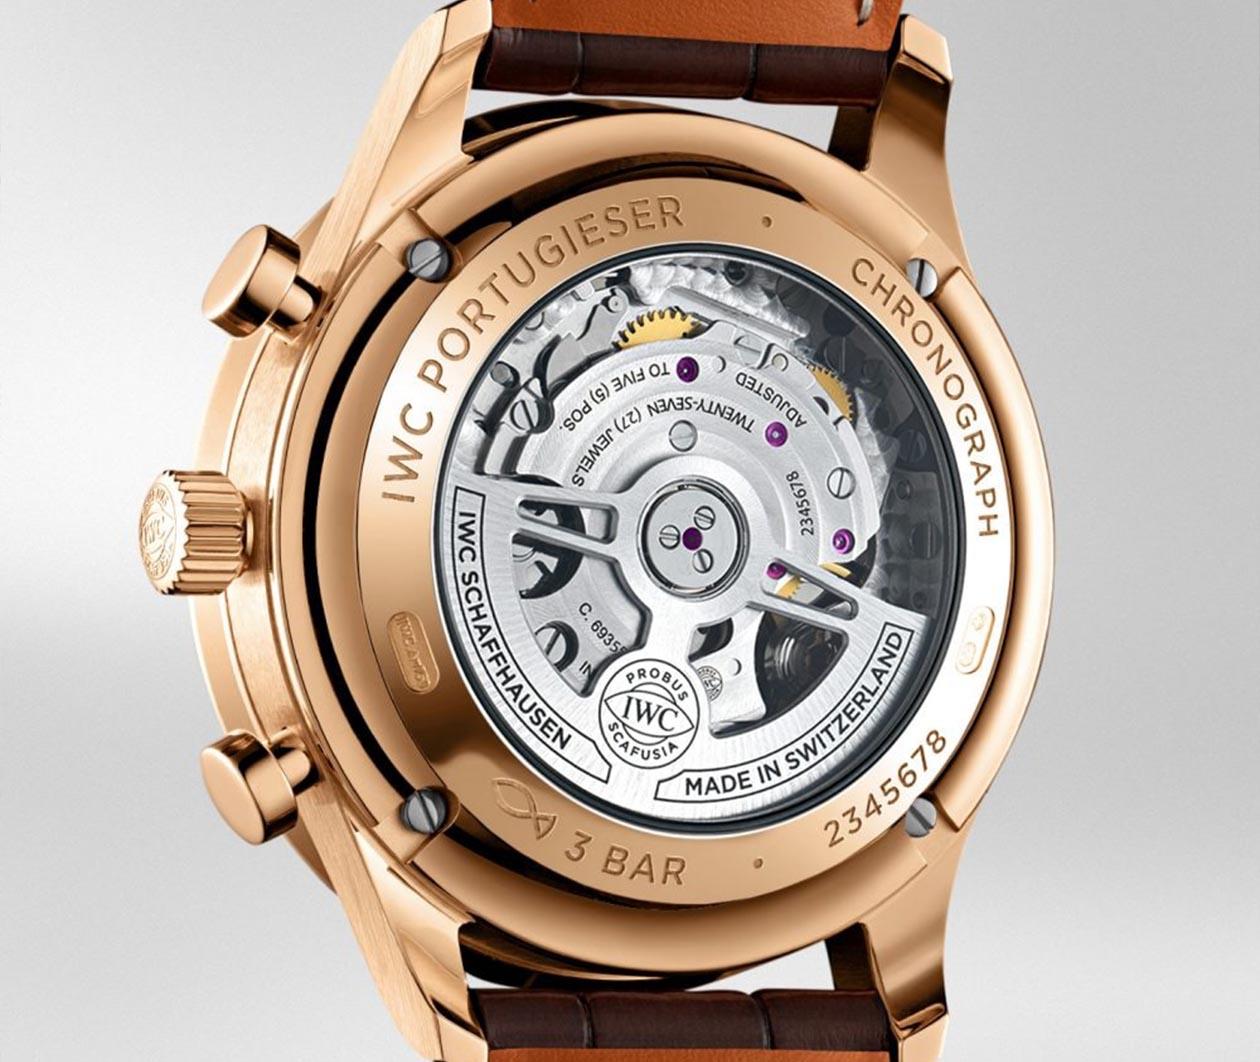 IWC Portugieser Chronograph IW371611 Carousel 5 FINAL